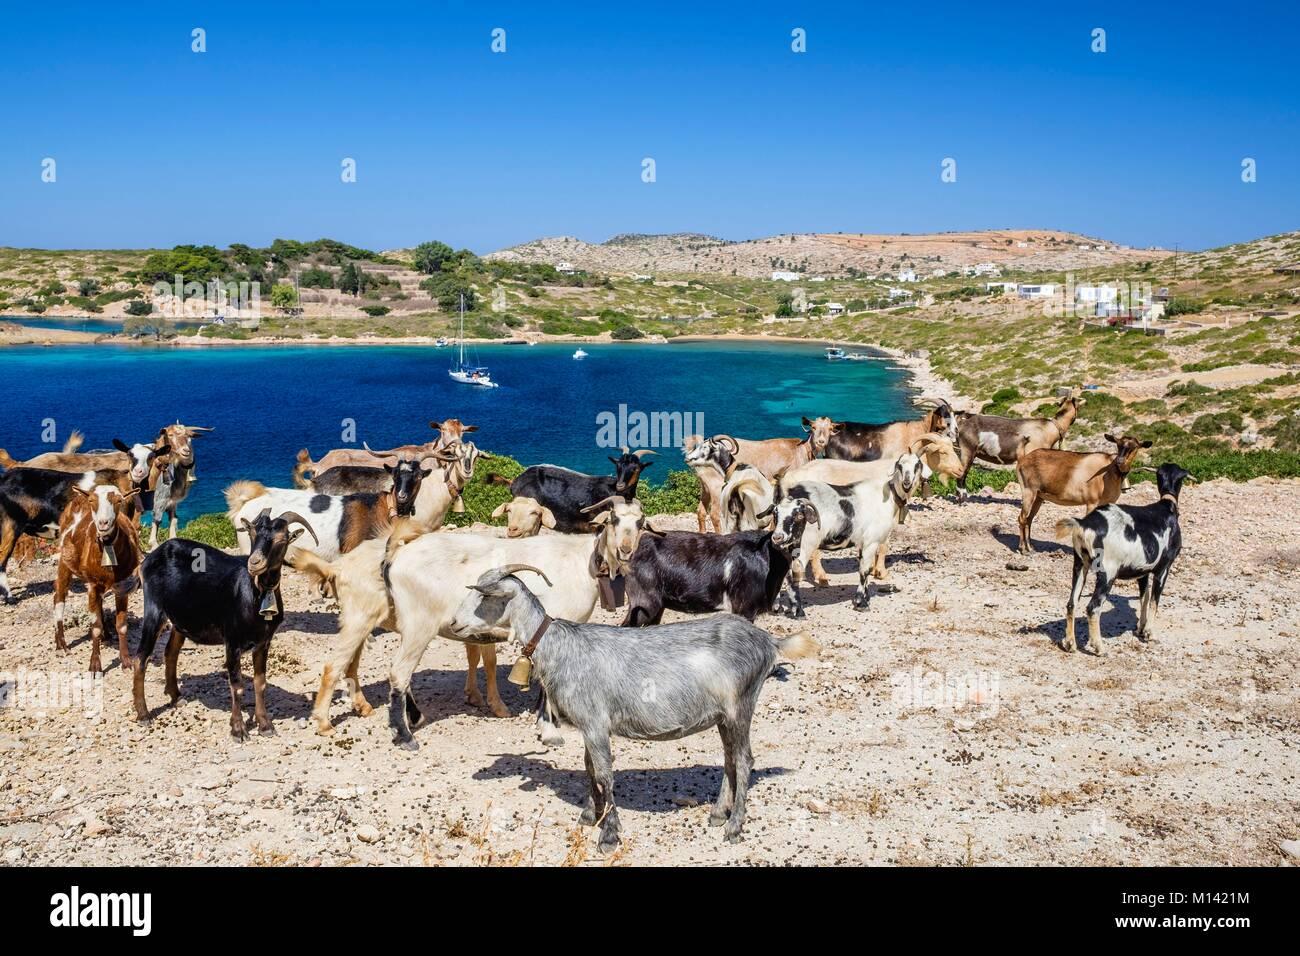 Geece, Dodecanese archipelago, Arki island, goats farming - Stock Image